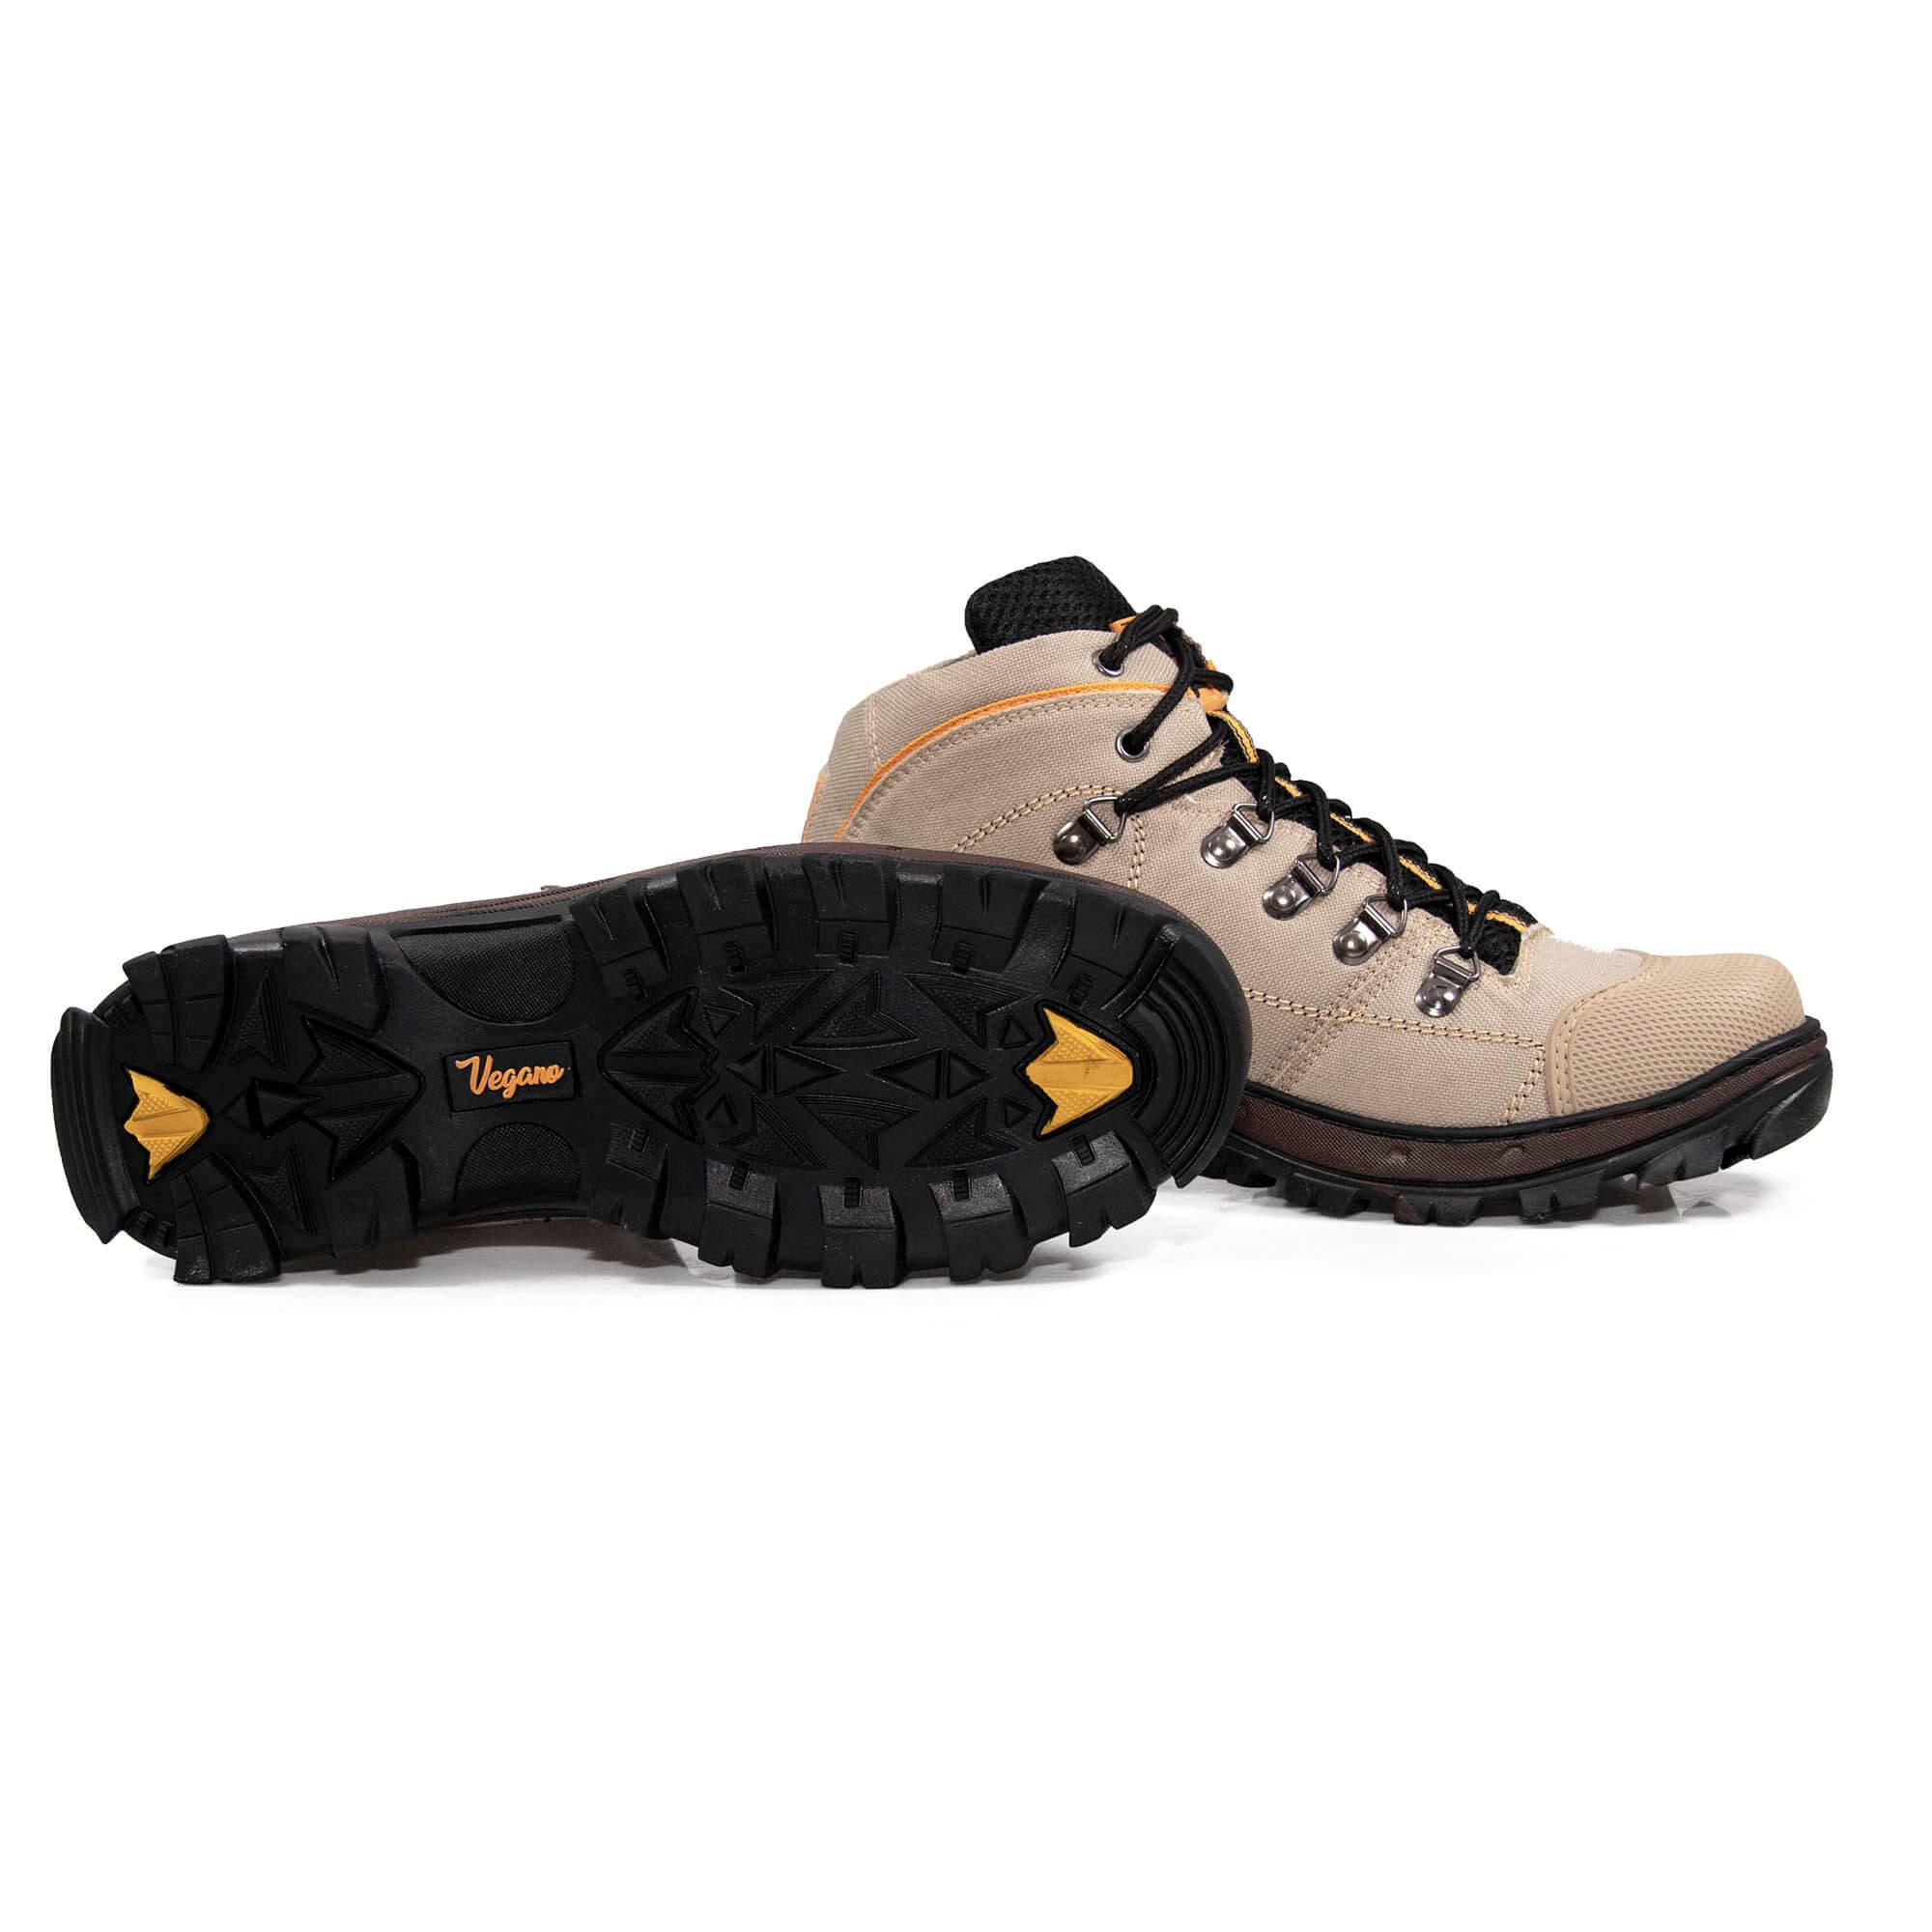 Bota Vegano Shoes Cross Amazônia Premium Bege